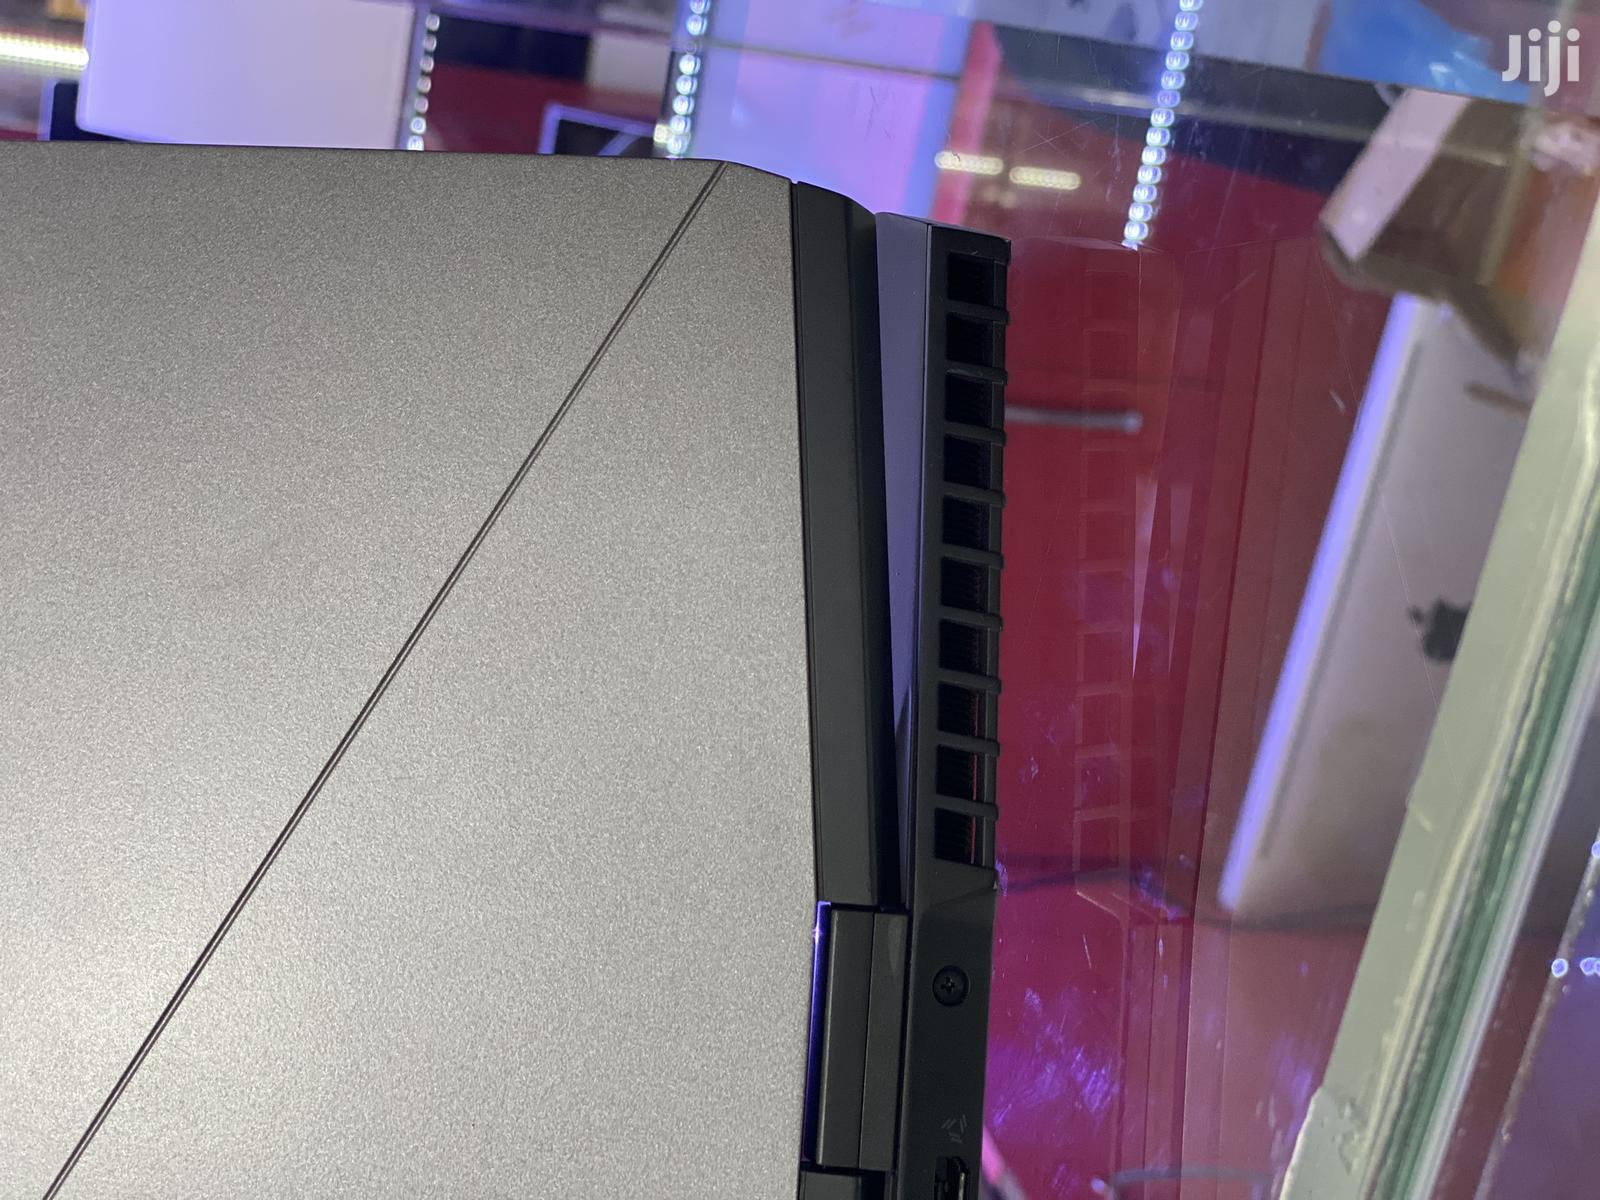 New Laptop Alienware M17x R2 32GB Intel Core i7 SSHD (Hybrid) 1T | Laptops & Computers for sale in Kampala, Central Region, Uganda